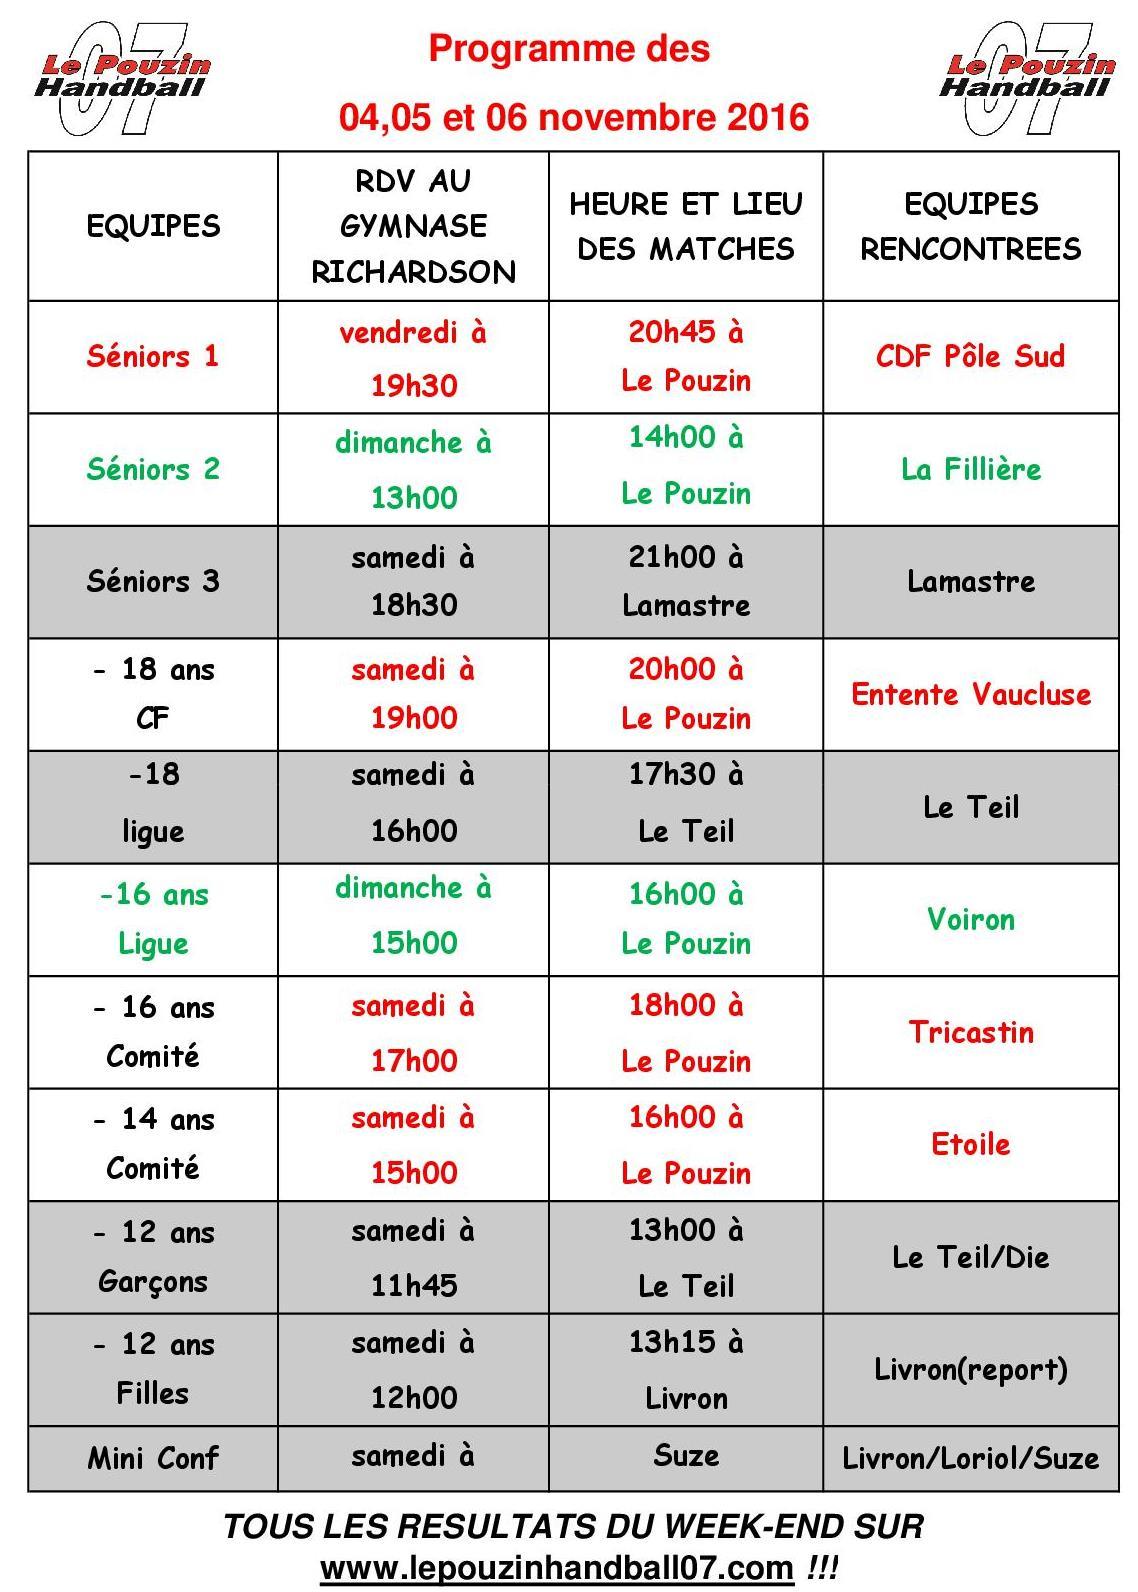 Programme week end 2016 11 05